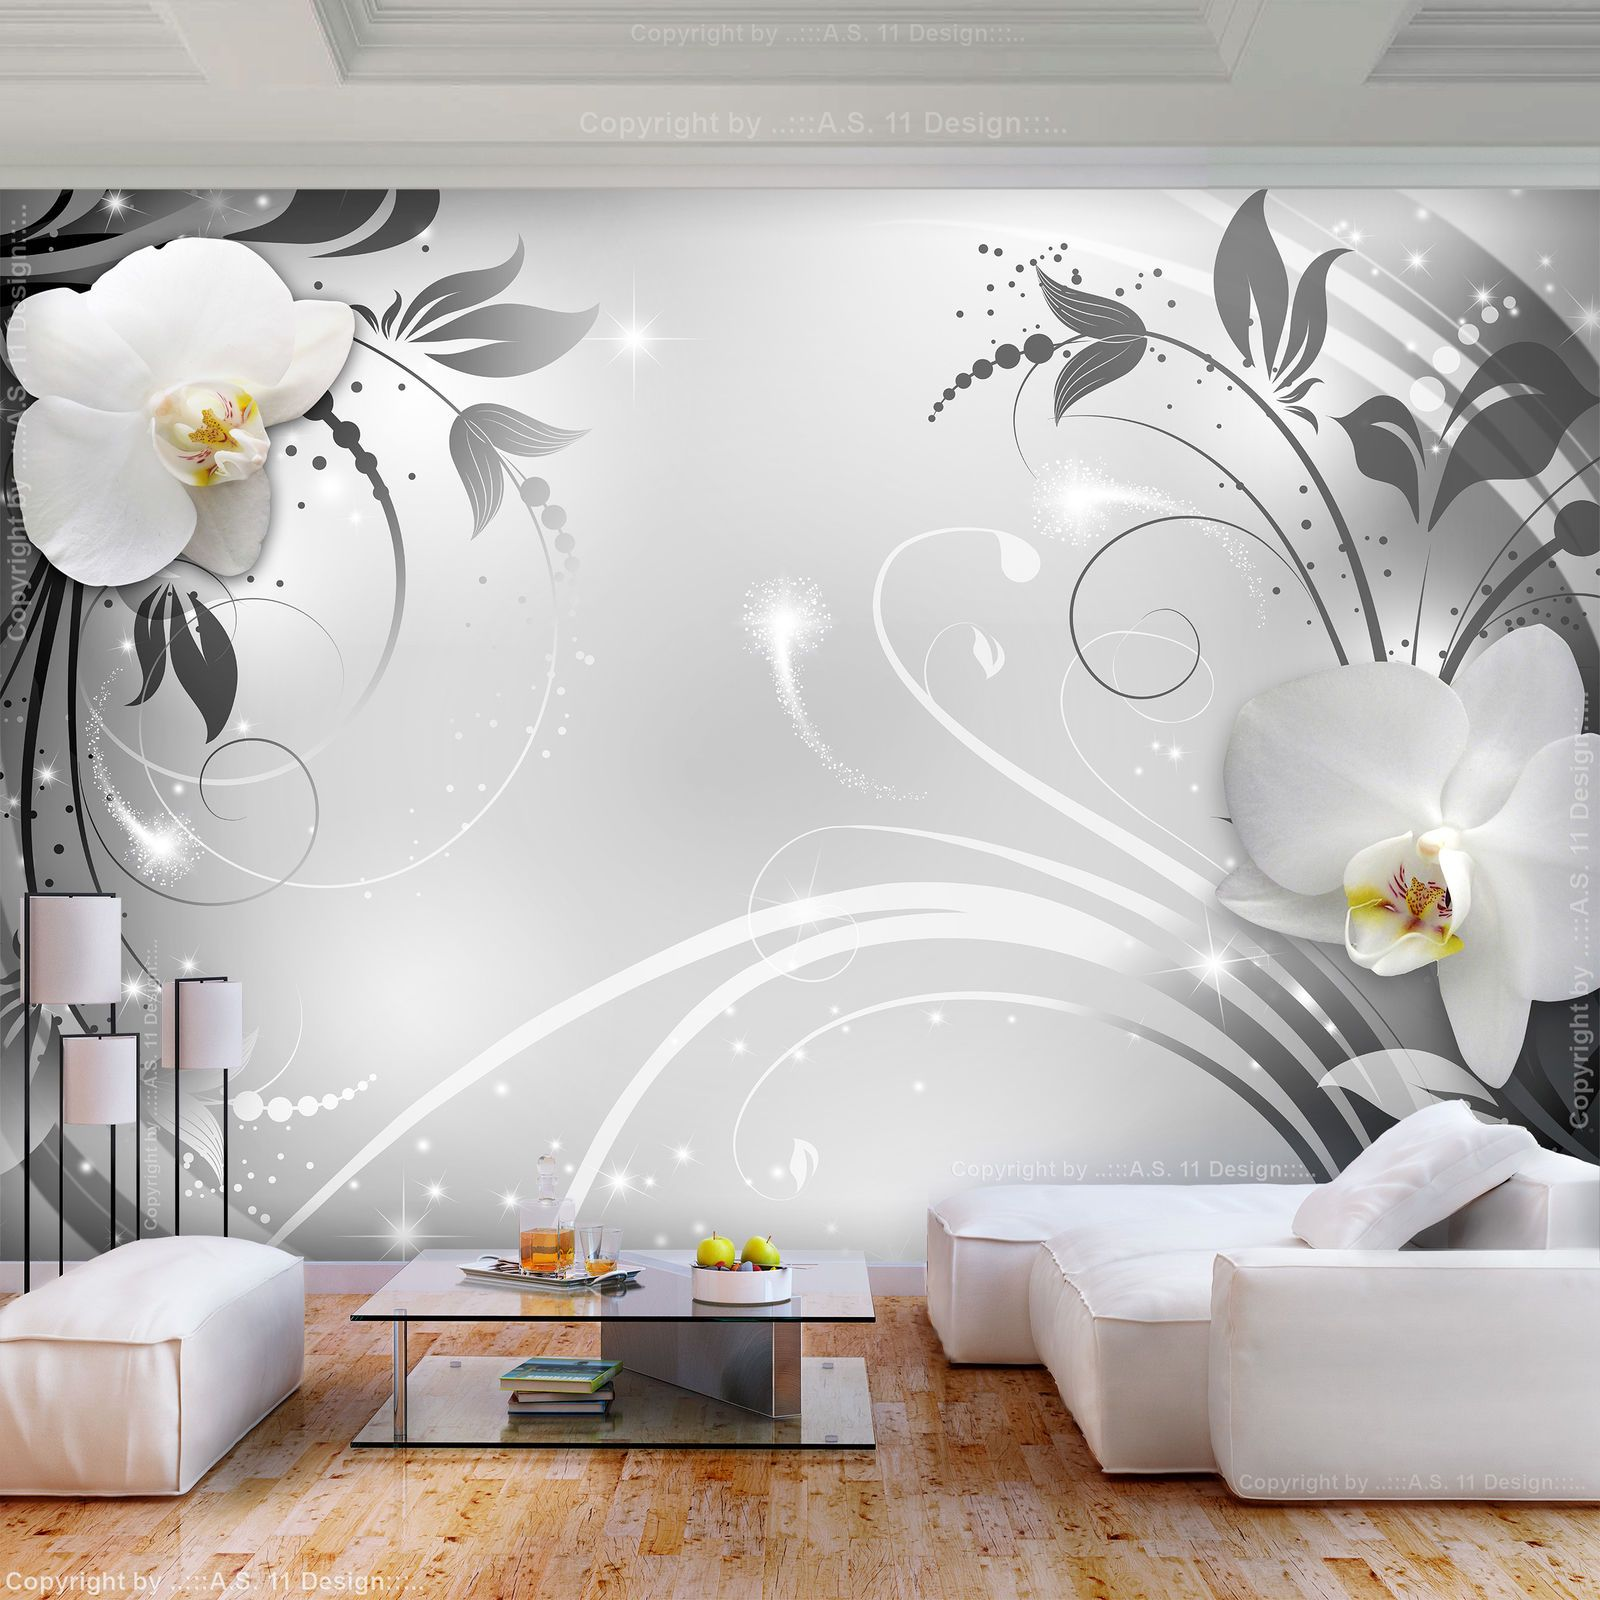 Vlies Fototapete 3d Effekt Blumen Tapete Schlafzimmer Wandbilder Xxl 3 Farbe Eur 8 99 Fertig Wandbilder L Fototapete Tapeten Wandbilder Tapete Schlafzimmer